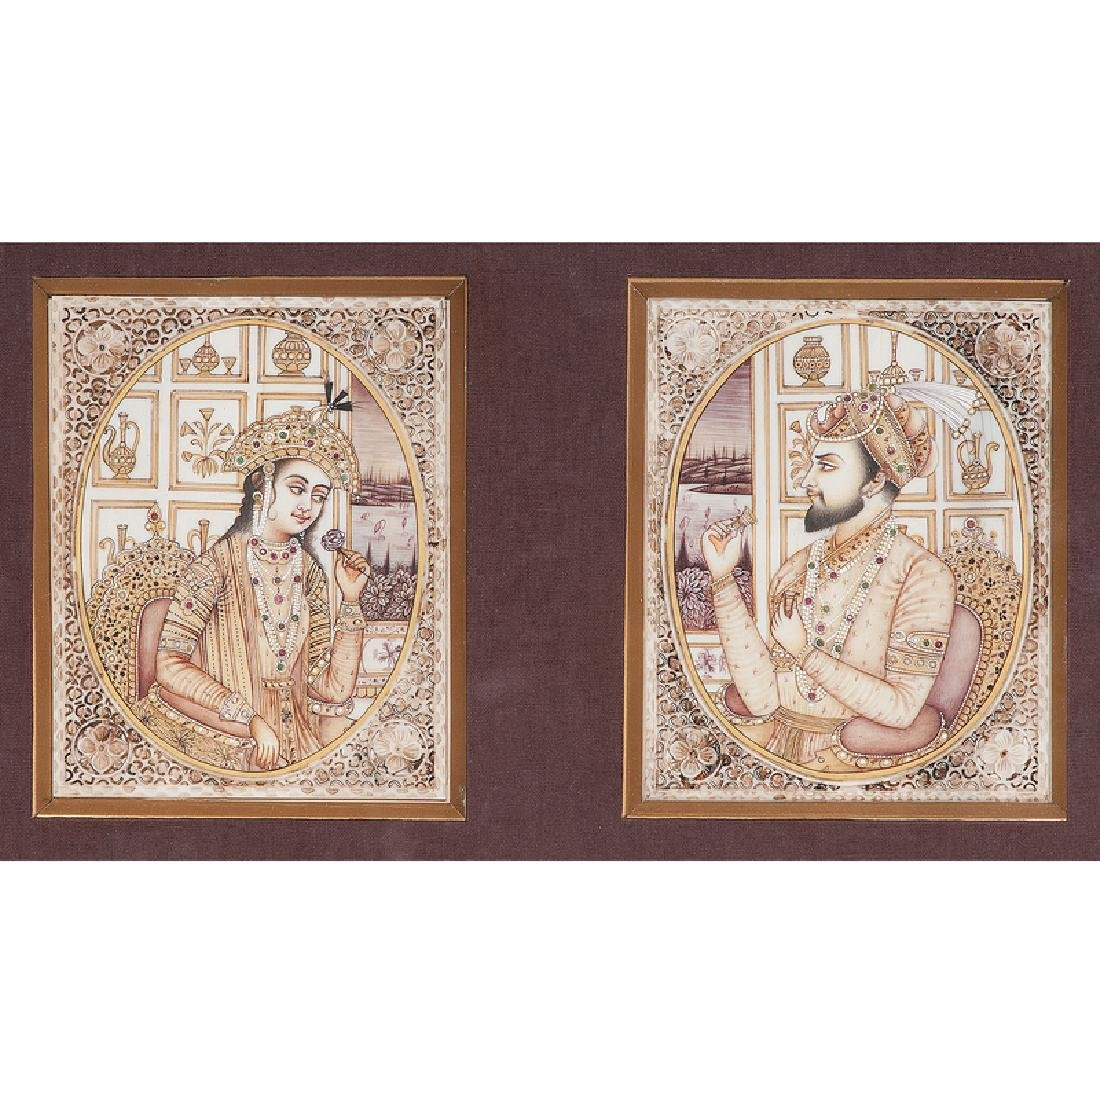 Indian School Portraits of Shah Jahan and Mumtaz Mahal